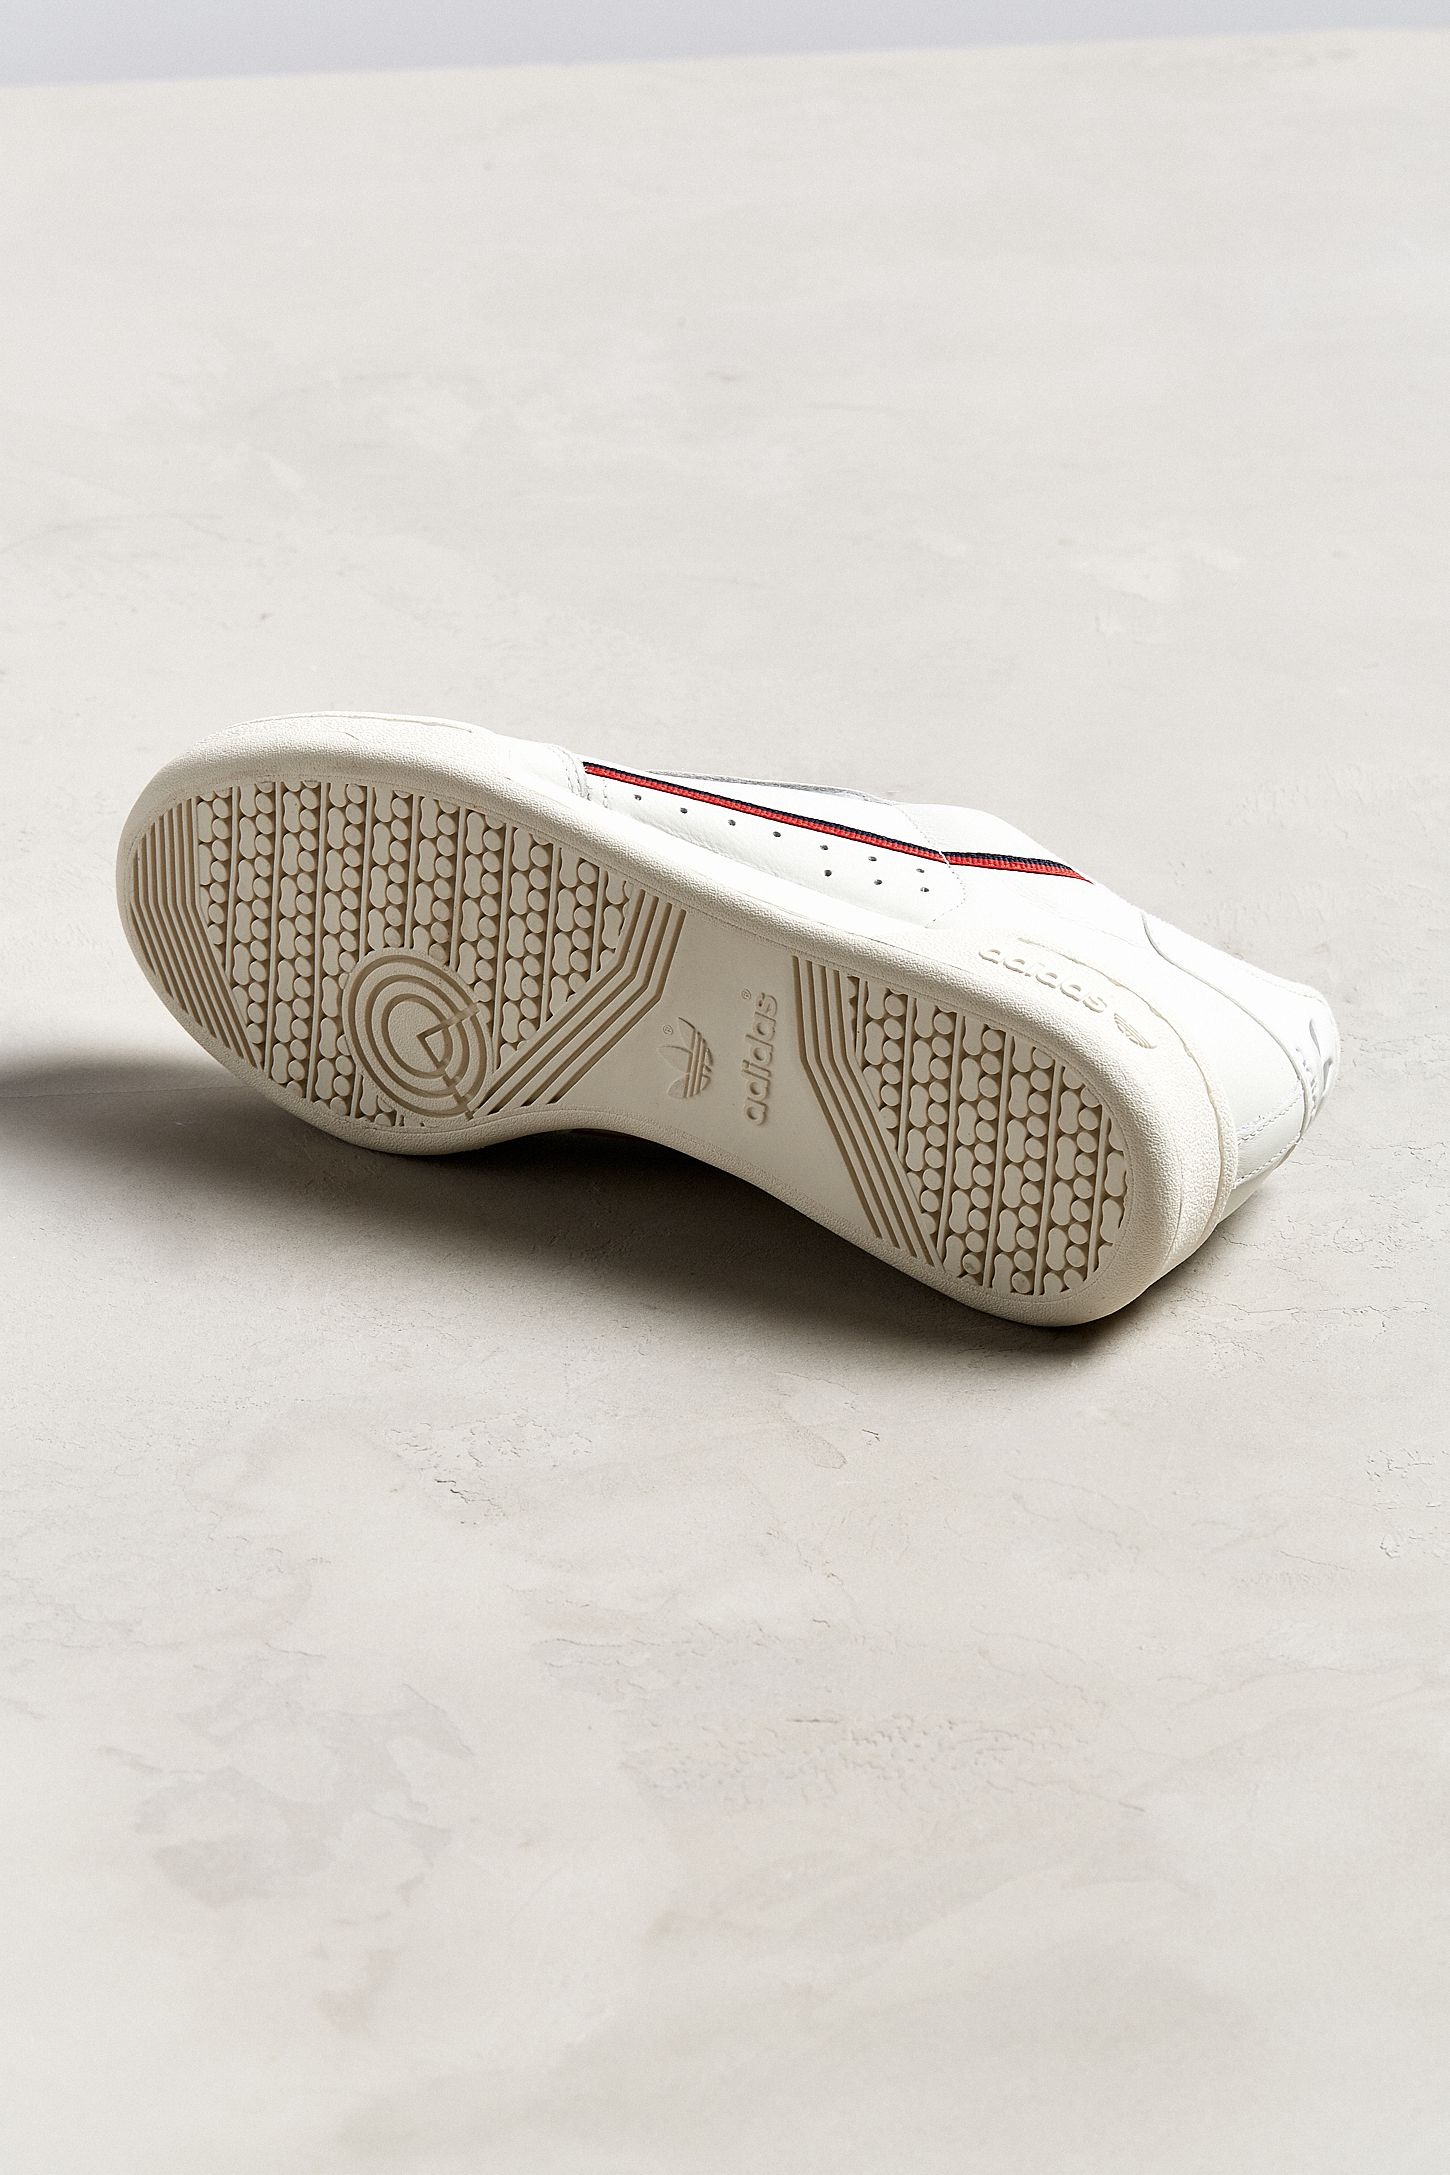 big sale 8fcac a9d87 Canada Cream Urban Outfitters Sneaker Xwyyvi7 80 Adidas Continental Btw5w